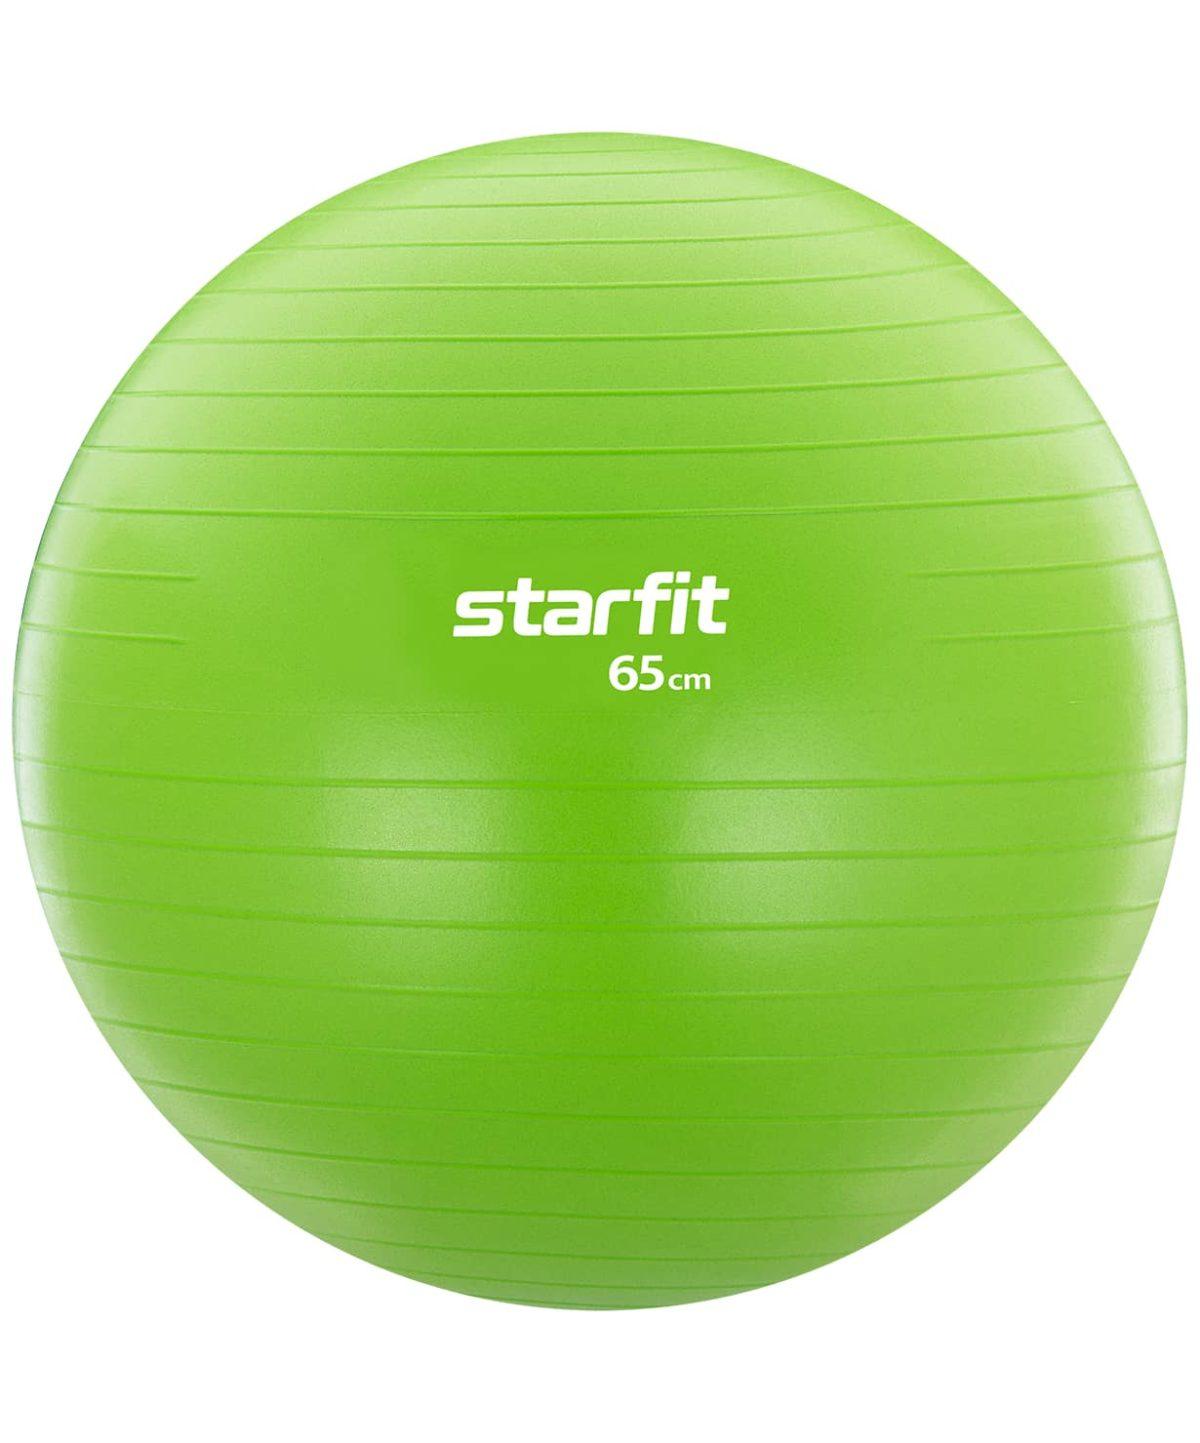 STARFIT Фитбол антивзрыв 65см.1000гр. без насоса GB-104: зелёный - 1